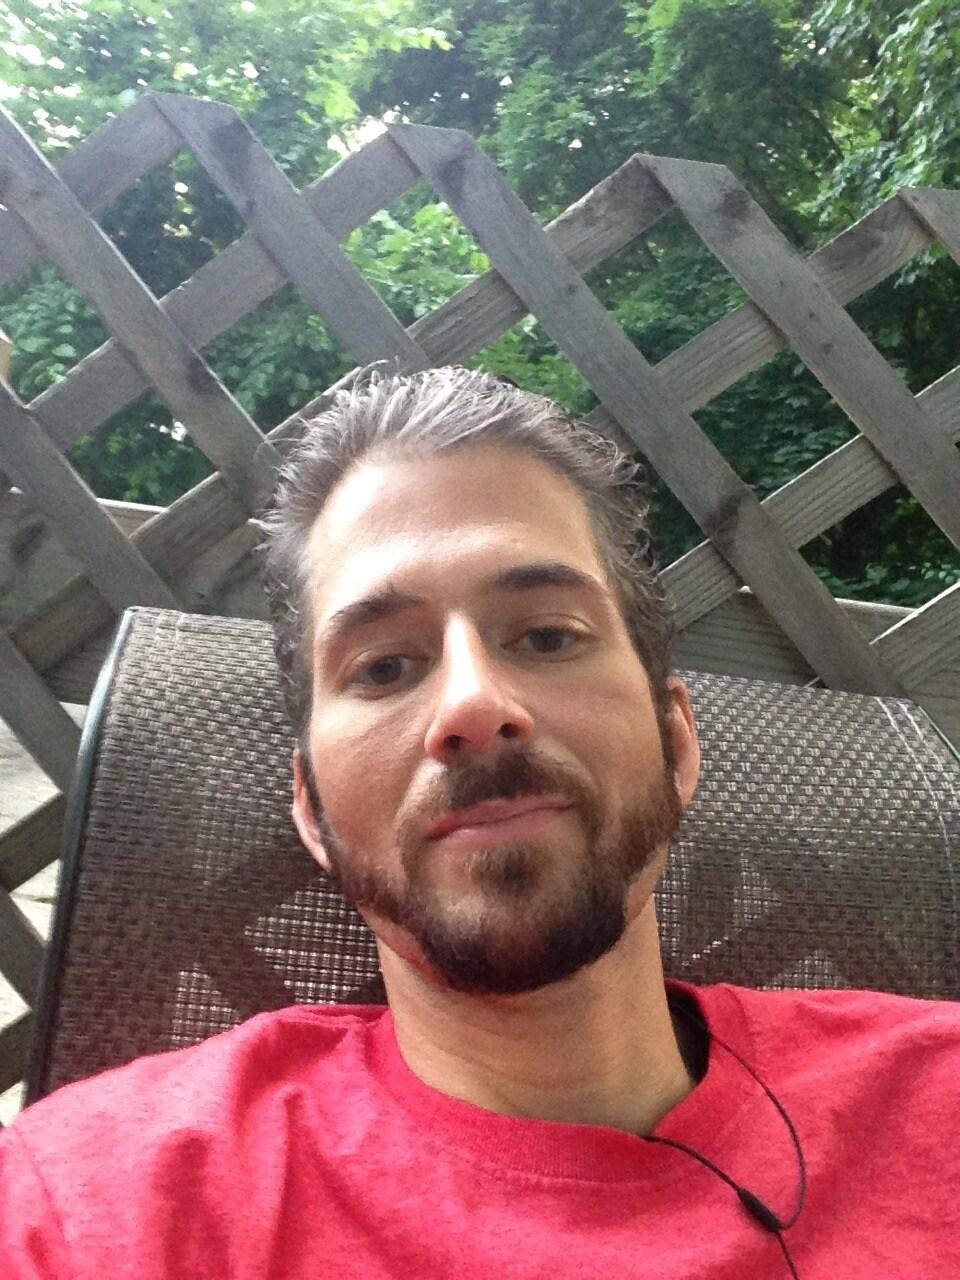 Jason From Wilton, NH